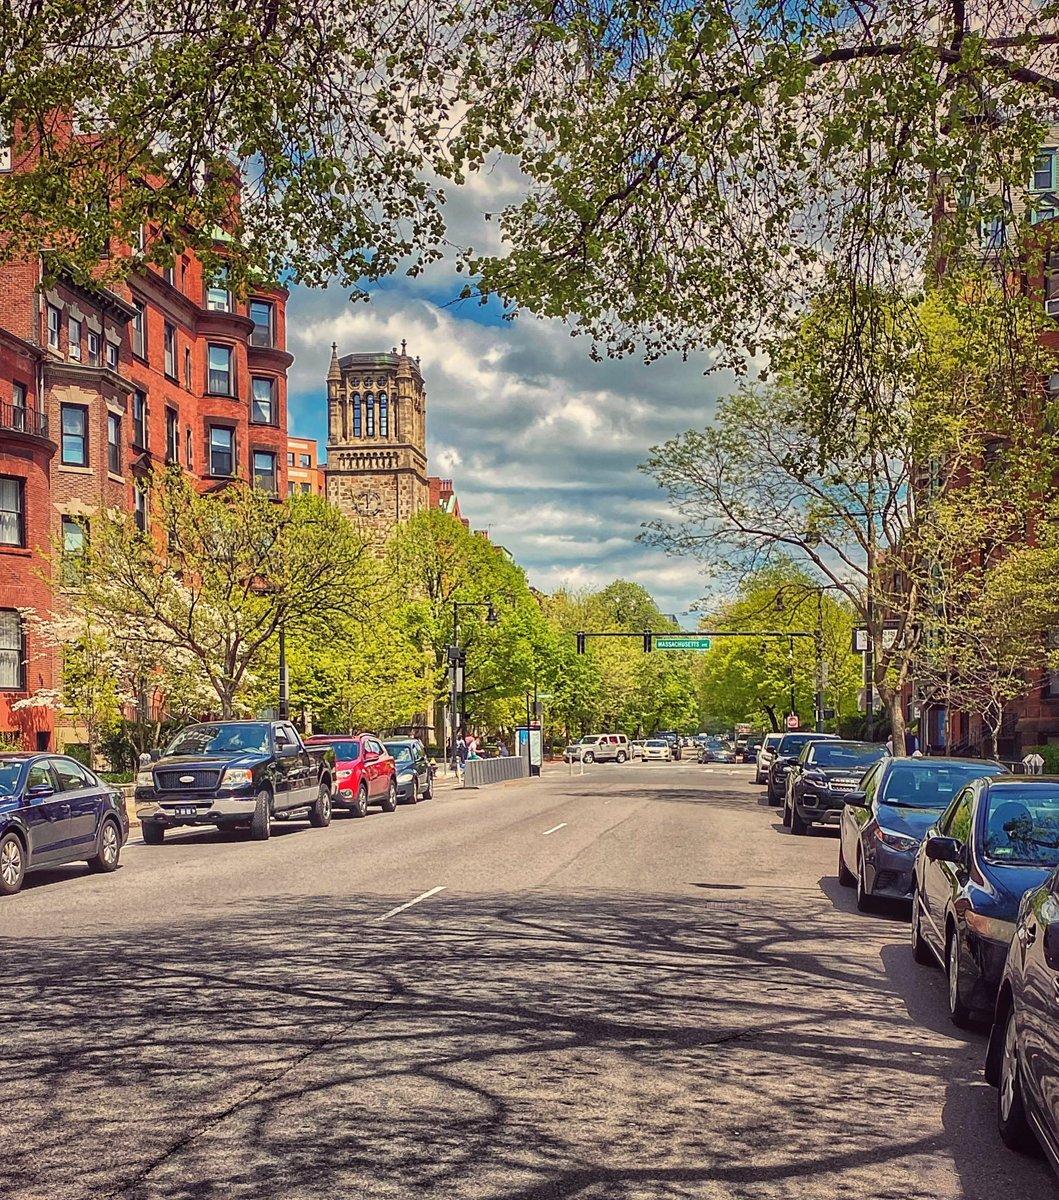 Happy Memorial Day Weekend Everyone! It's looking like summer in Boston! #MemorialDayWeekend #Boston pic.twitter.com/eXhXYOdP7B